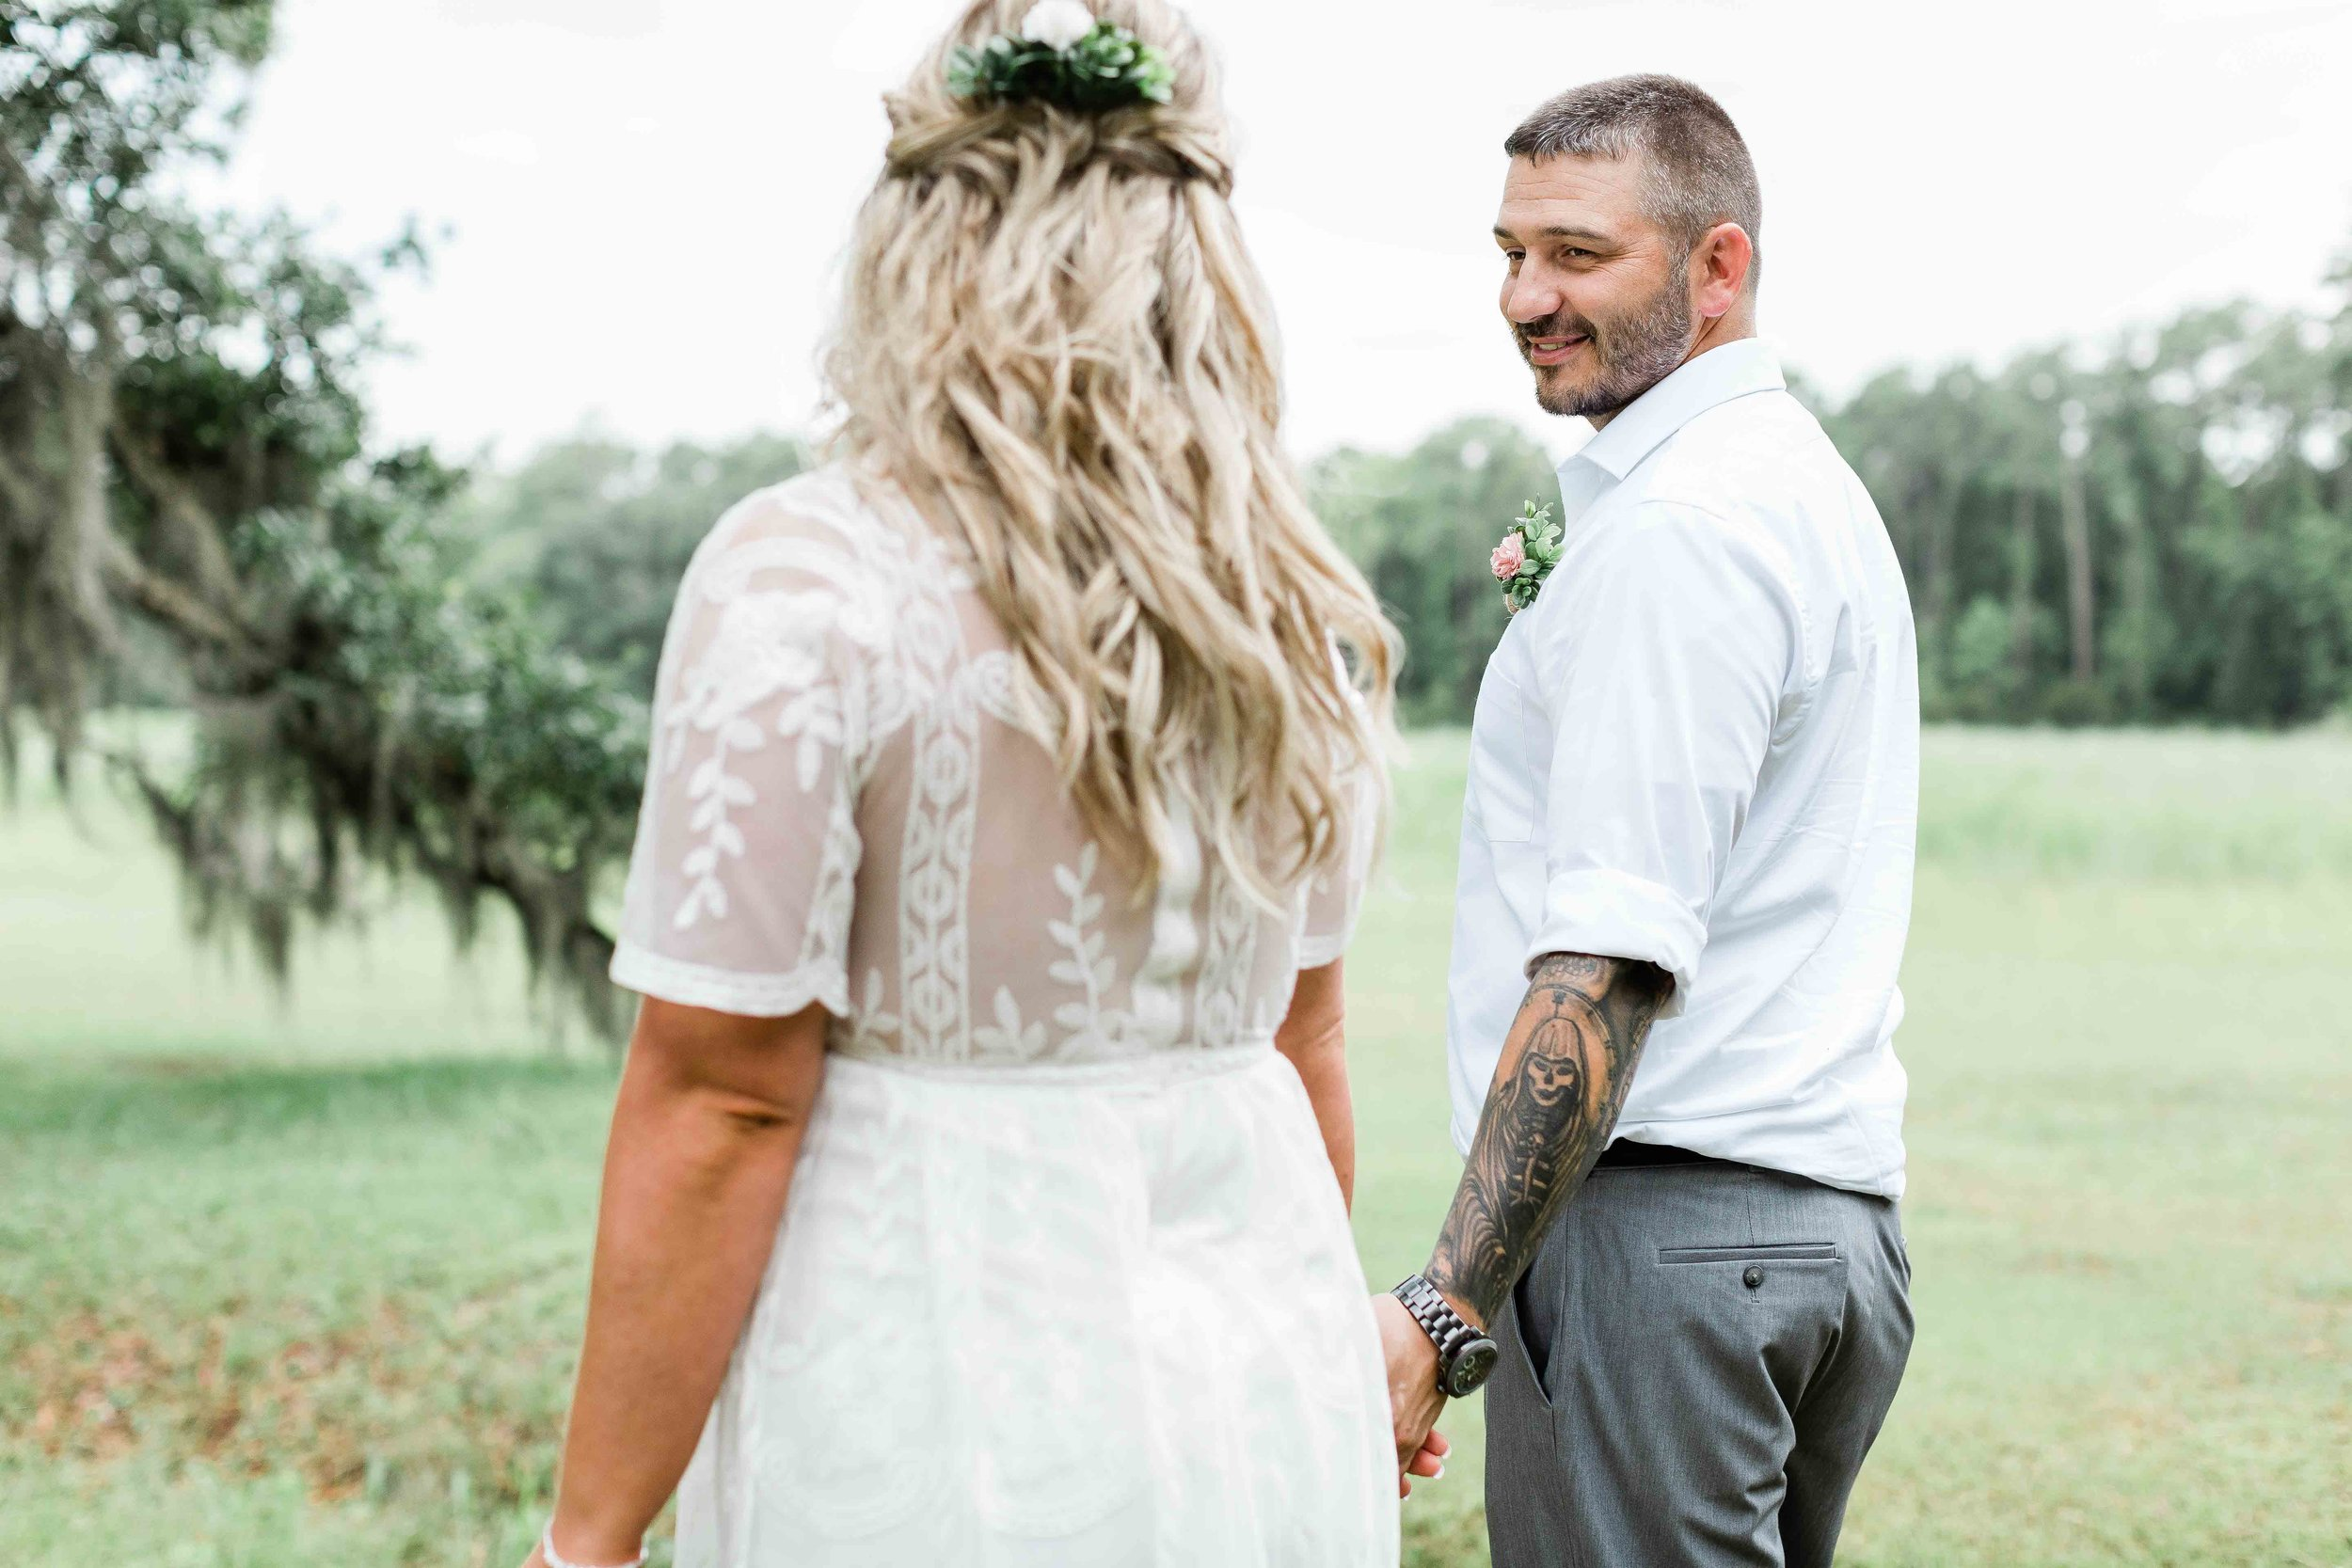 20190727Georgia-Wormlsoe Plantation-Simply Eloped-Savannah Wedding Photographer- Southern Lens Photography14.jpg